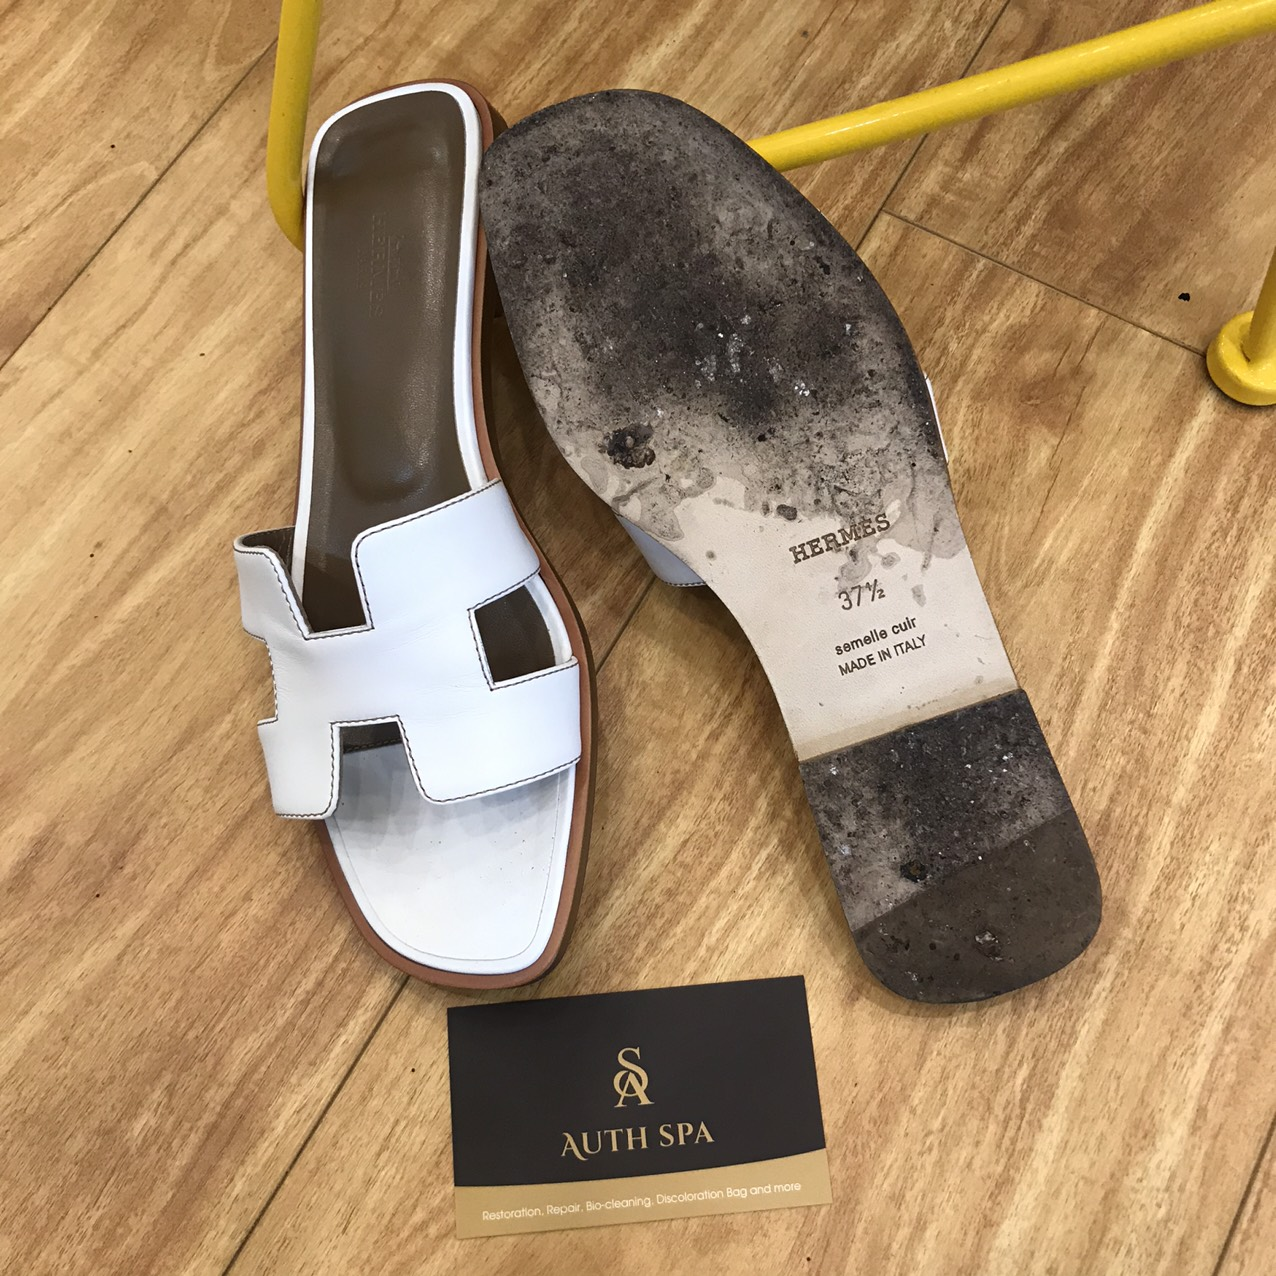 Sửa Chữa Giày Dép Gucci, Chanel, Louis Vuitton, Hermes ... 5